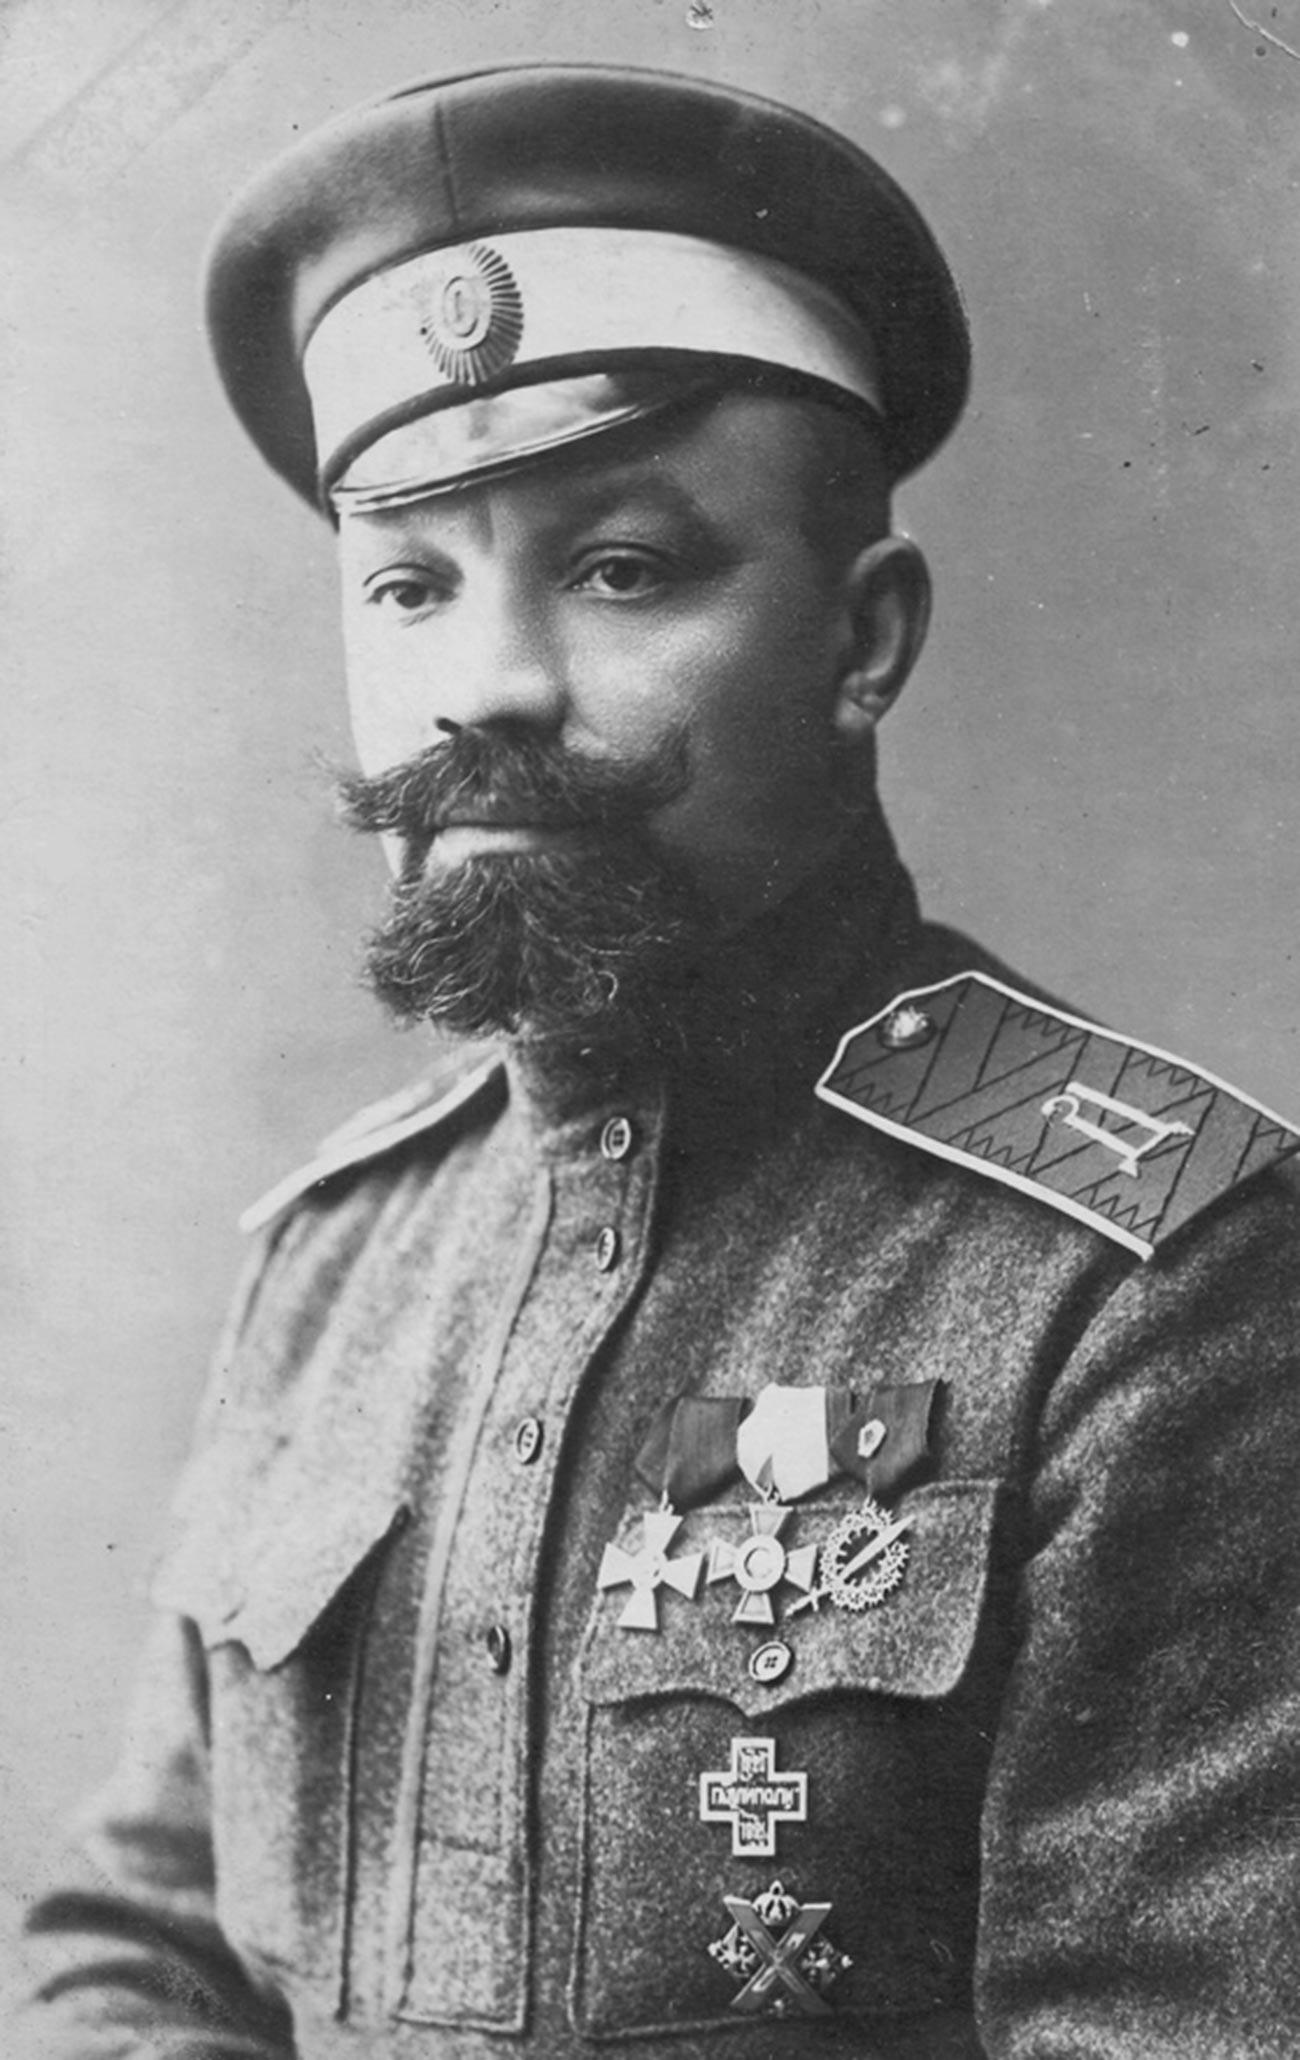 Alexander Koutepov